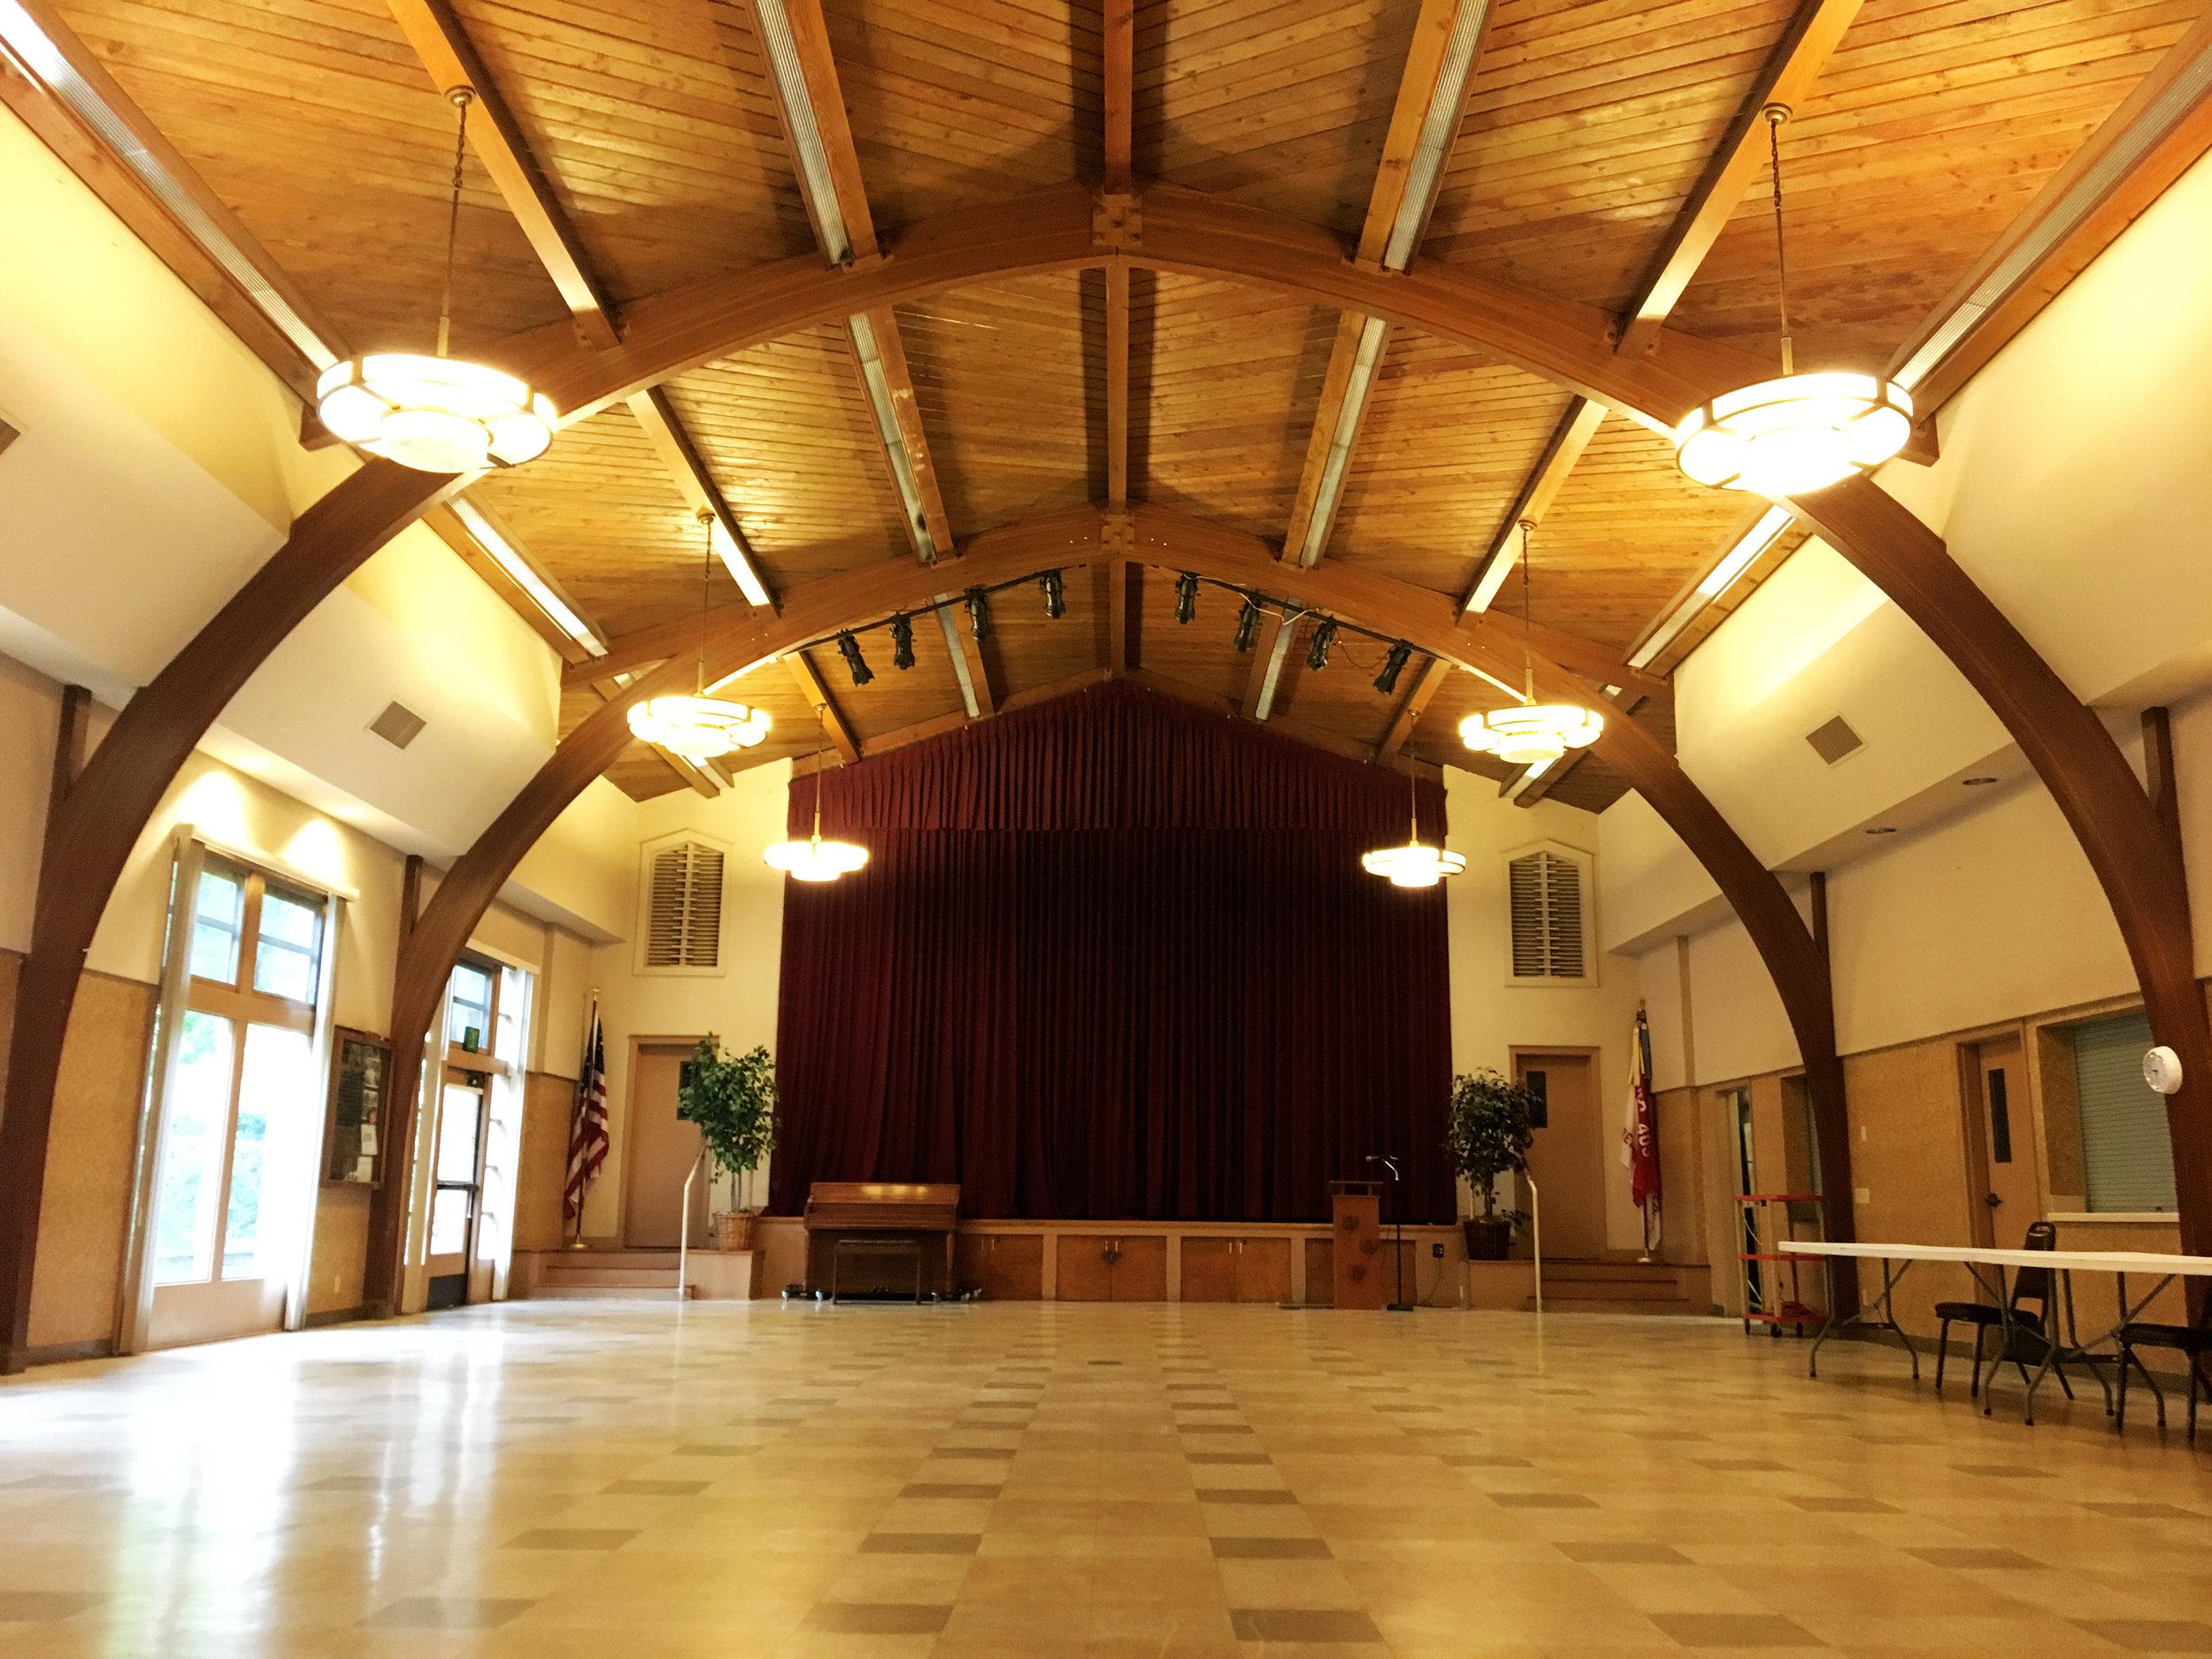 claremont-presbyterian-church-campus-tour-fellowship-hall-2.jpg